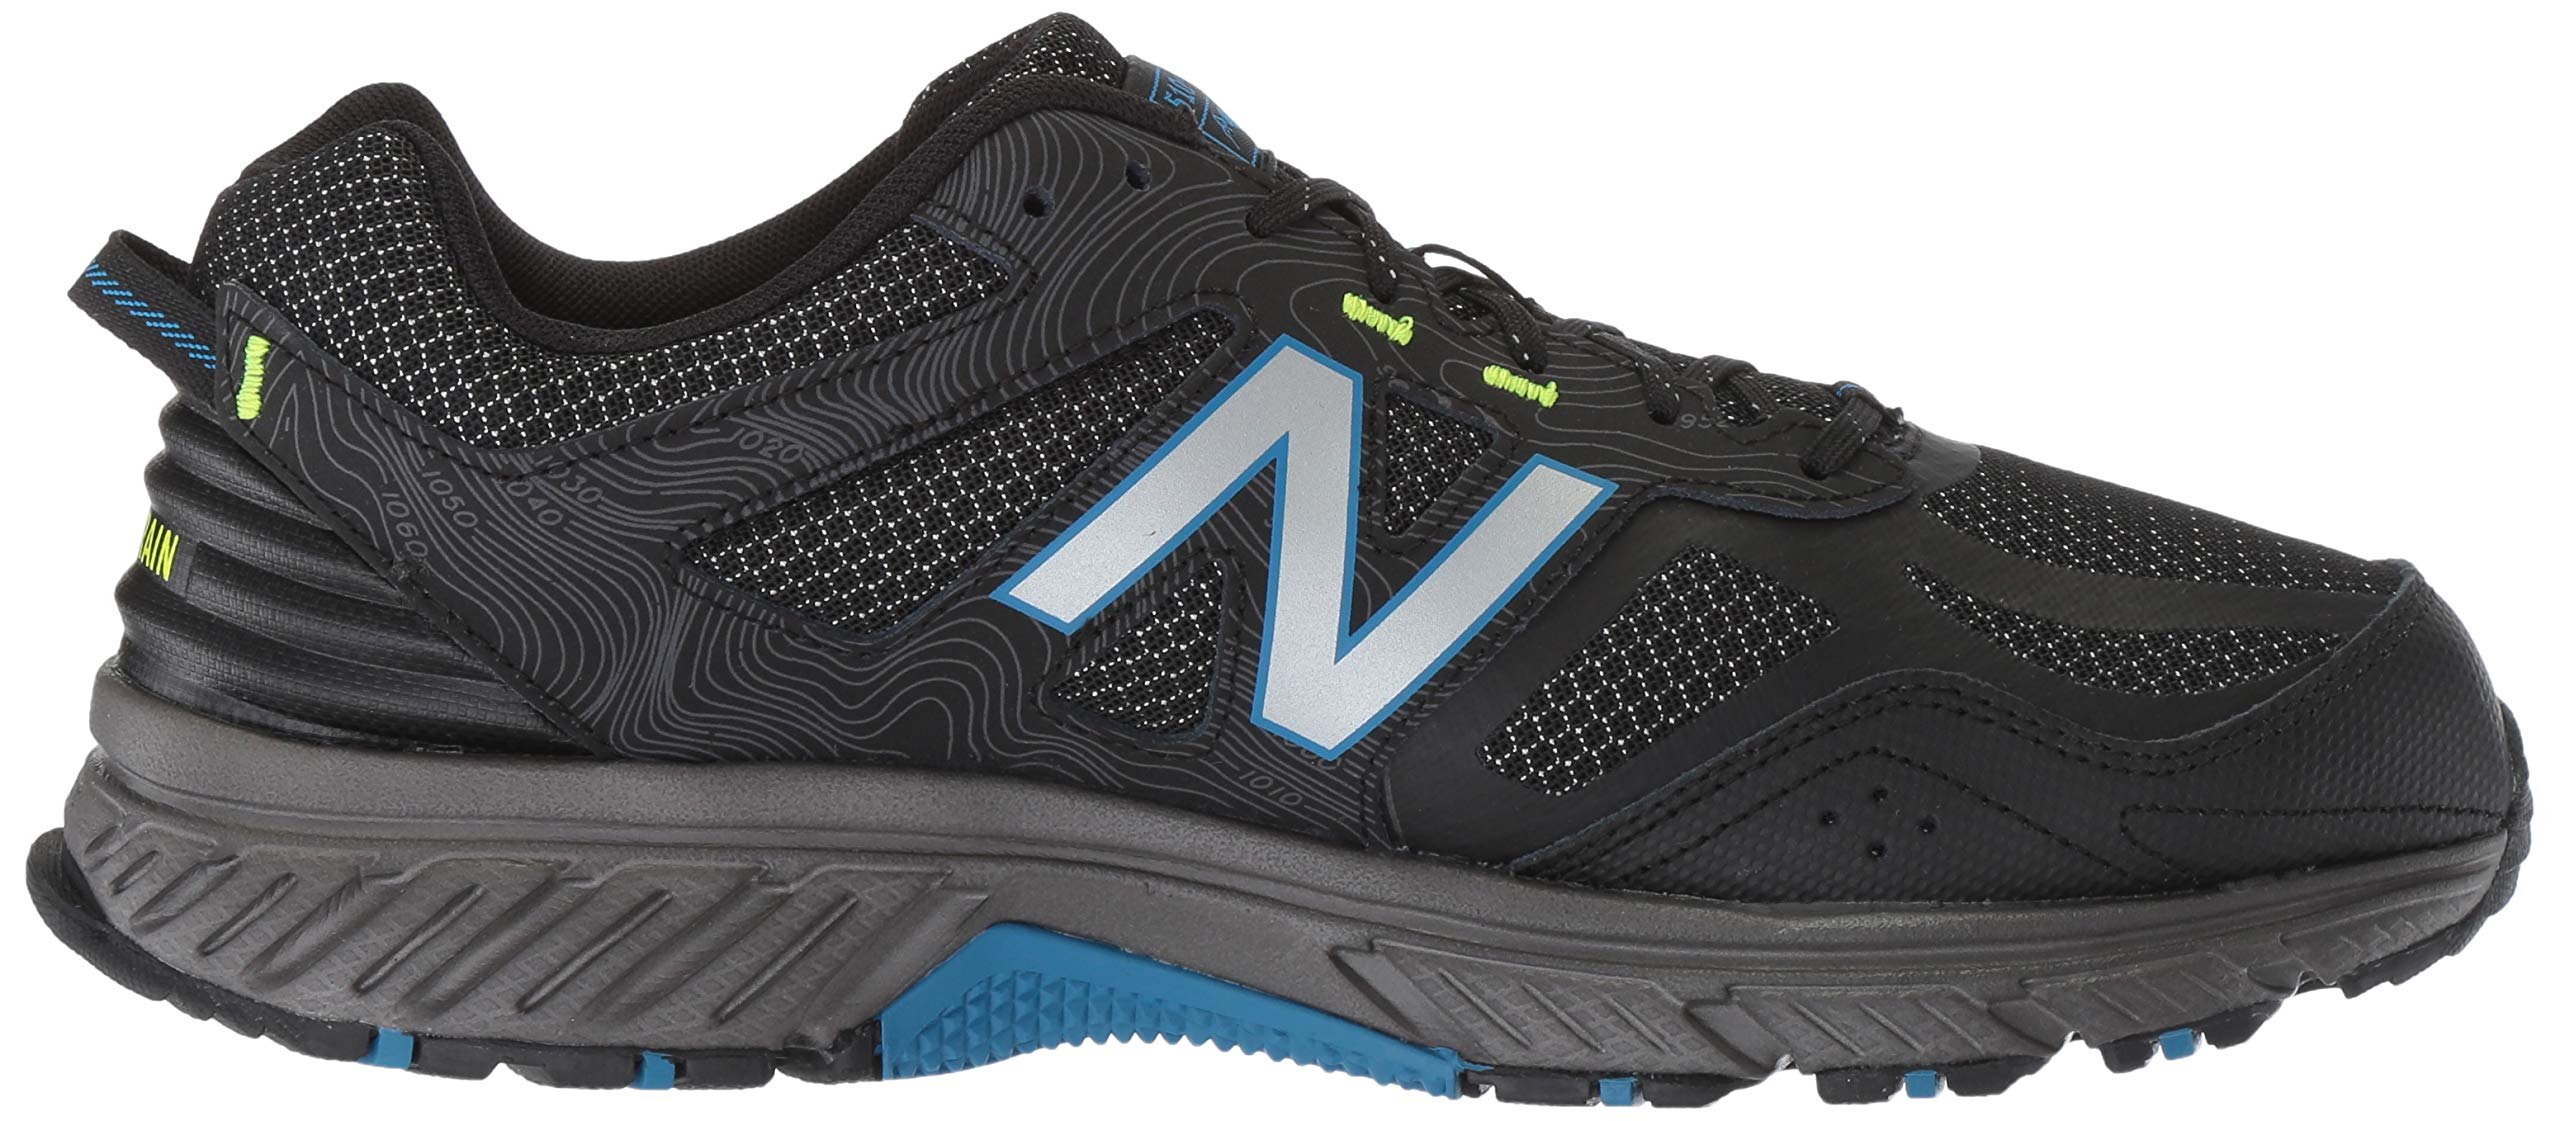 New Balance Men's 510v4 Cushioning Trail Running Shoe, Magnet/Black/Reflective, 7.5 D US by New Balance (Image #7)